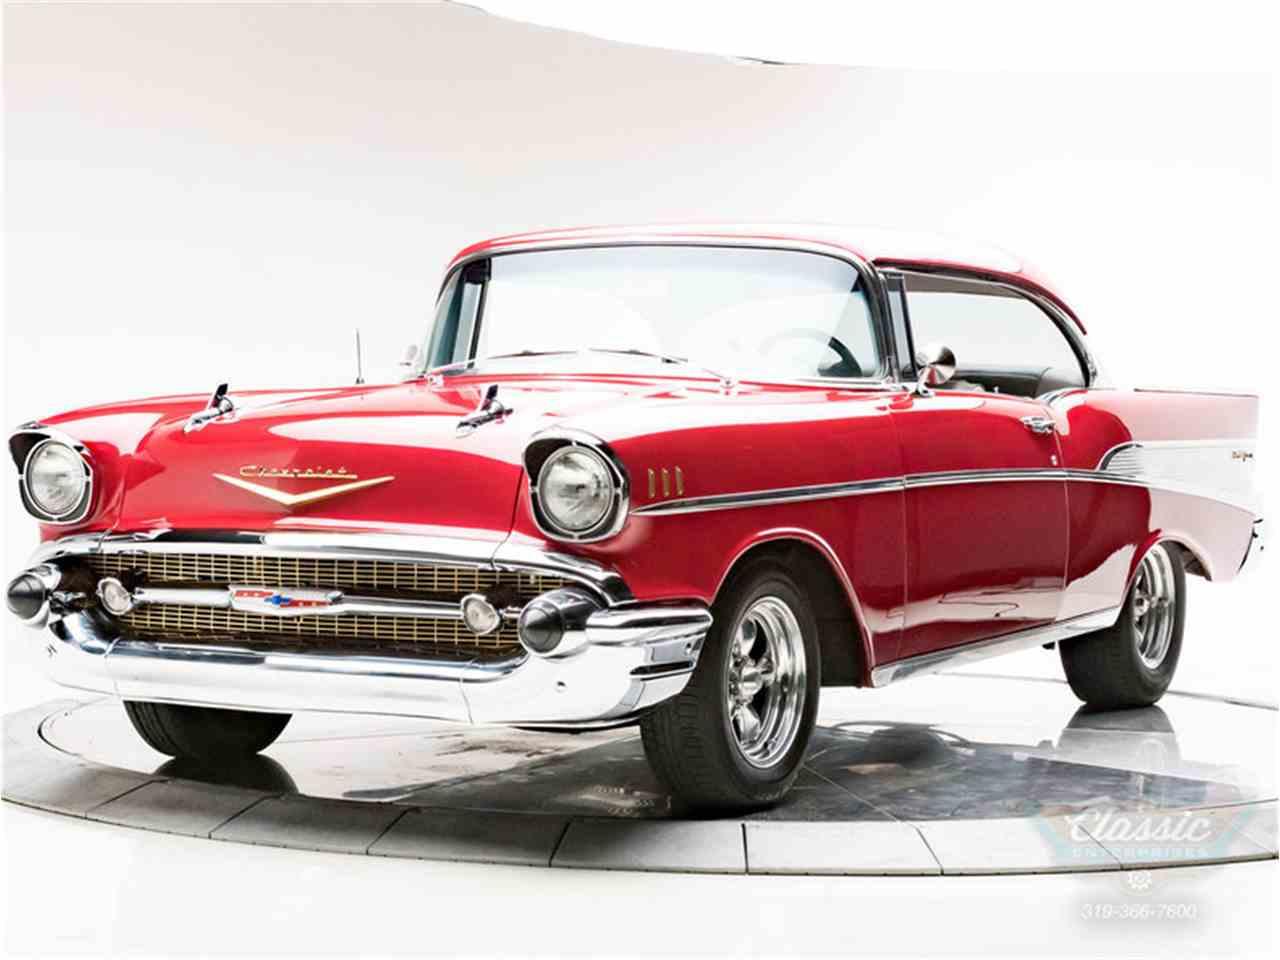 1957 Chevrolet Bel Air For Sale Classiccars Com Cc 1056477